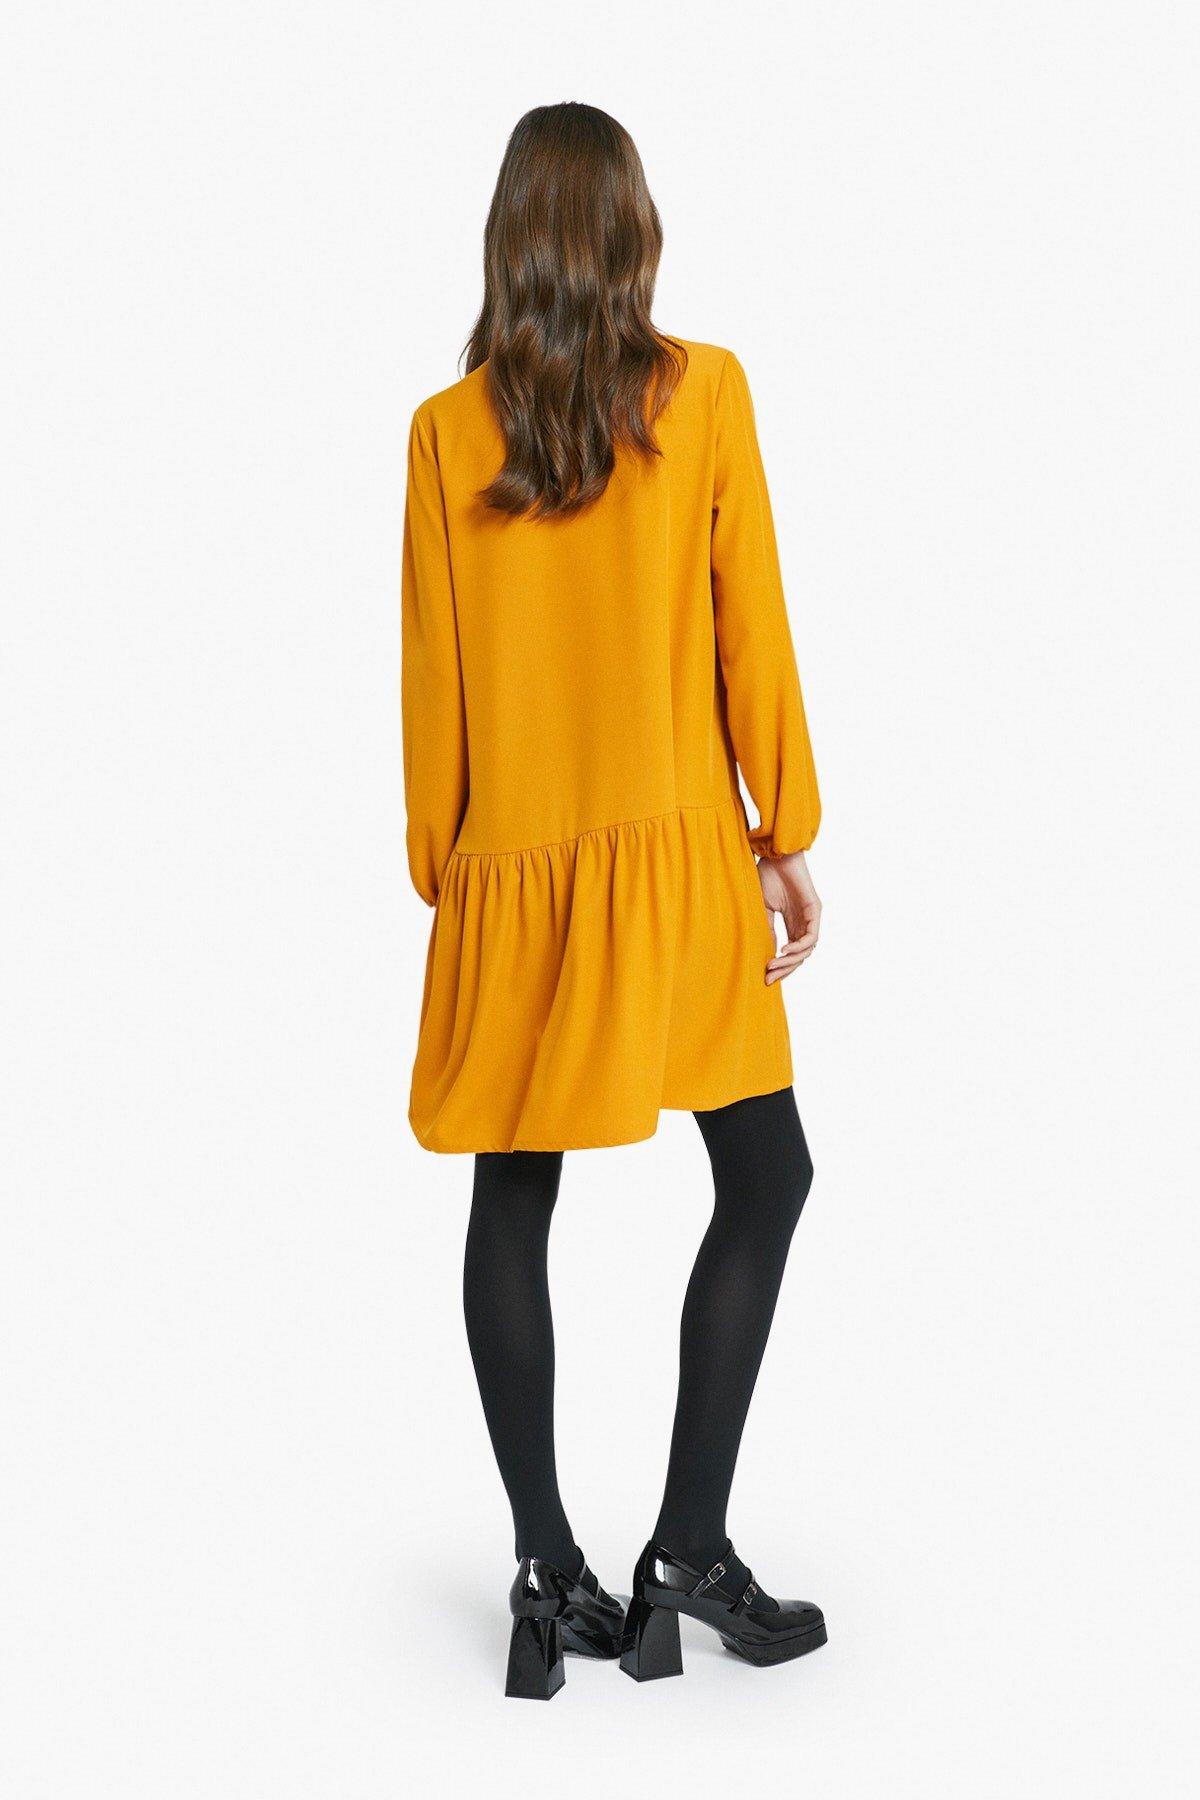 Mini dress with ruffle and zipper